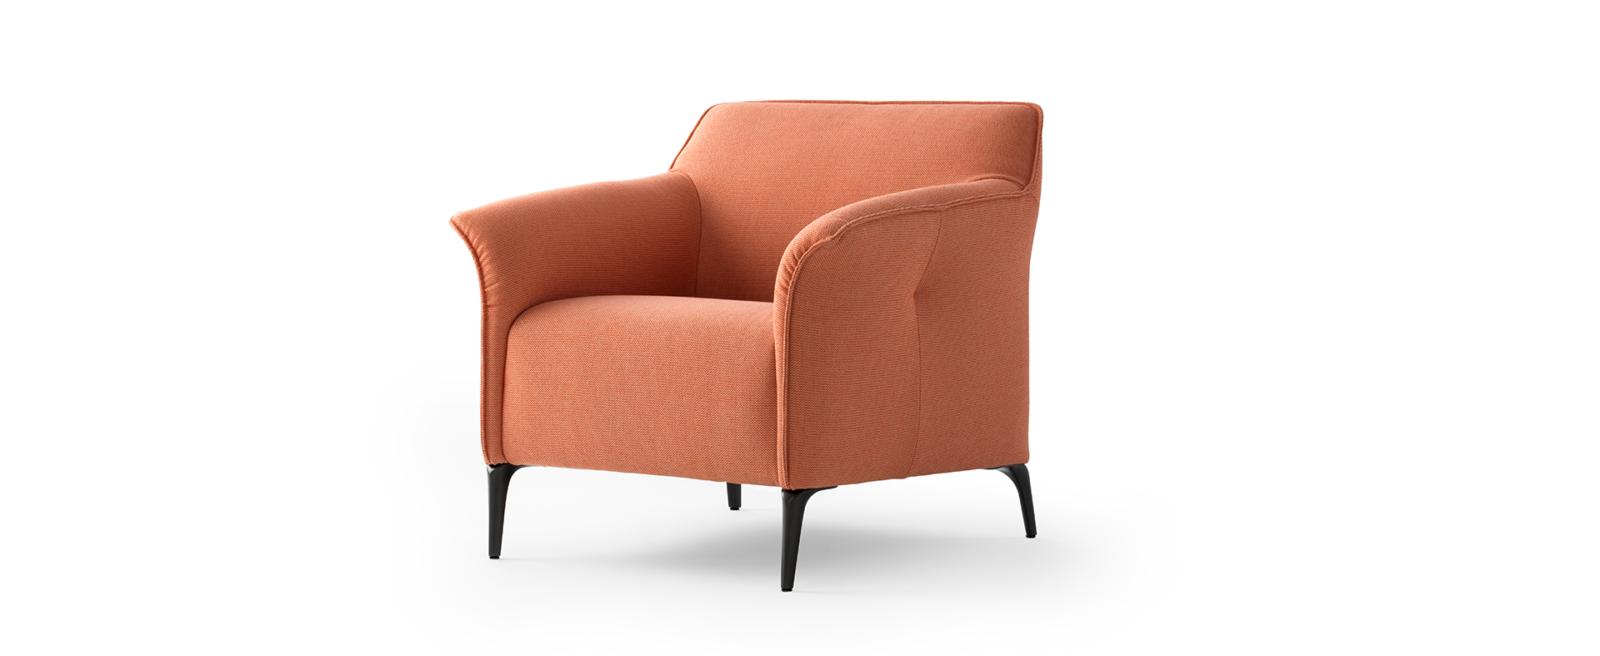 Leolux fauteuil Mayon